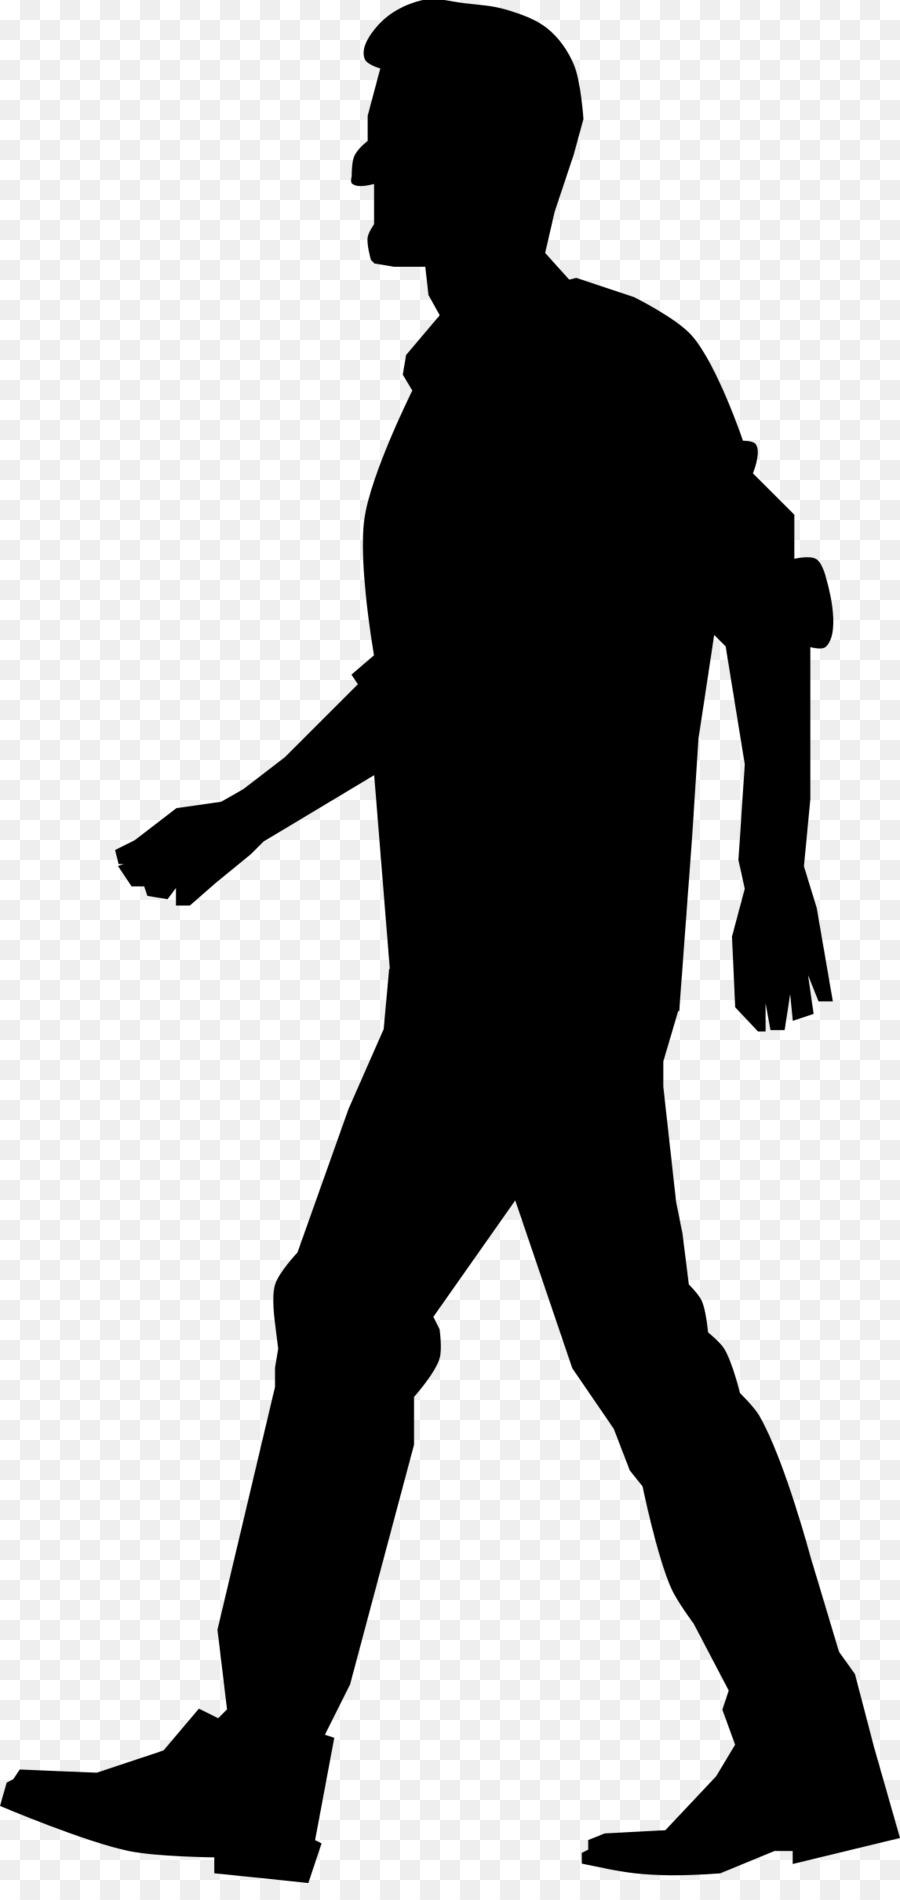 Walking man clipart image graphic royalty free Man Cartoon clipart - Walking, Man, transparent clip art graphic royalty free